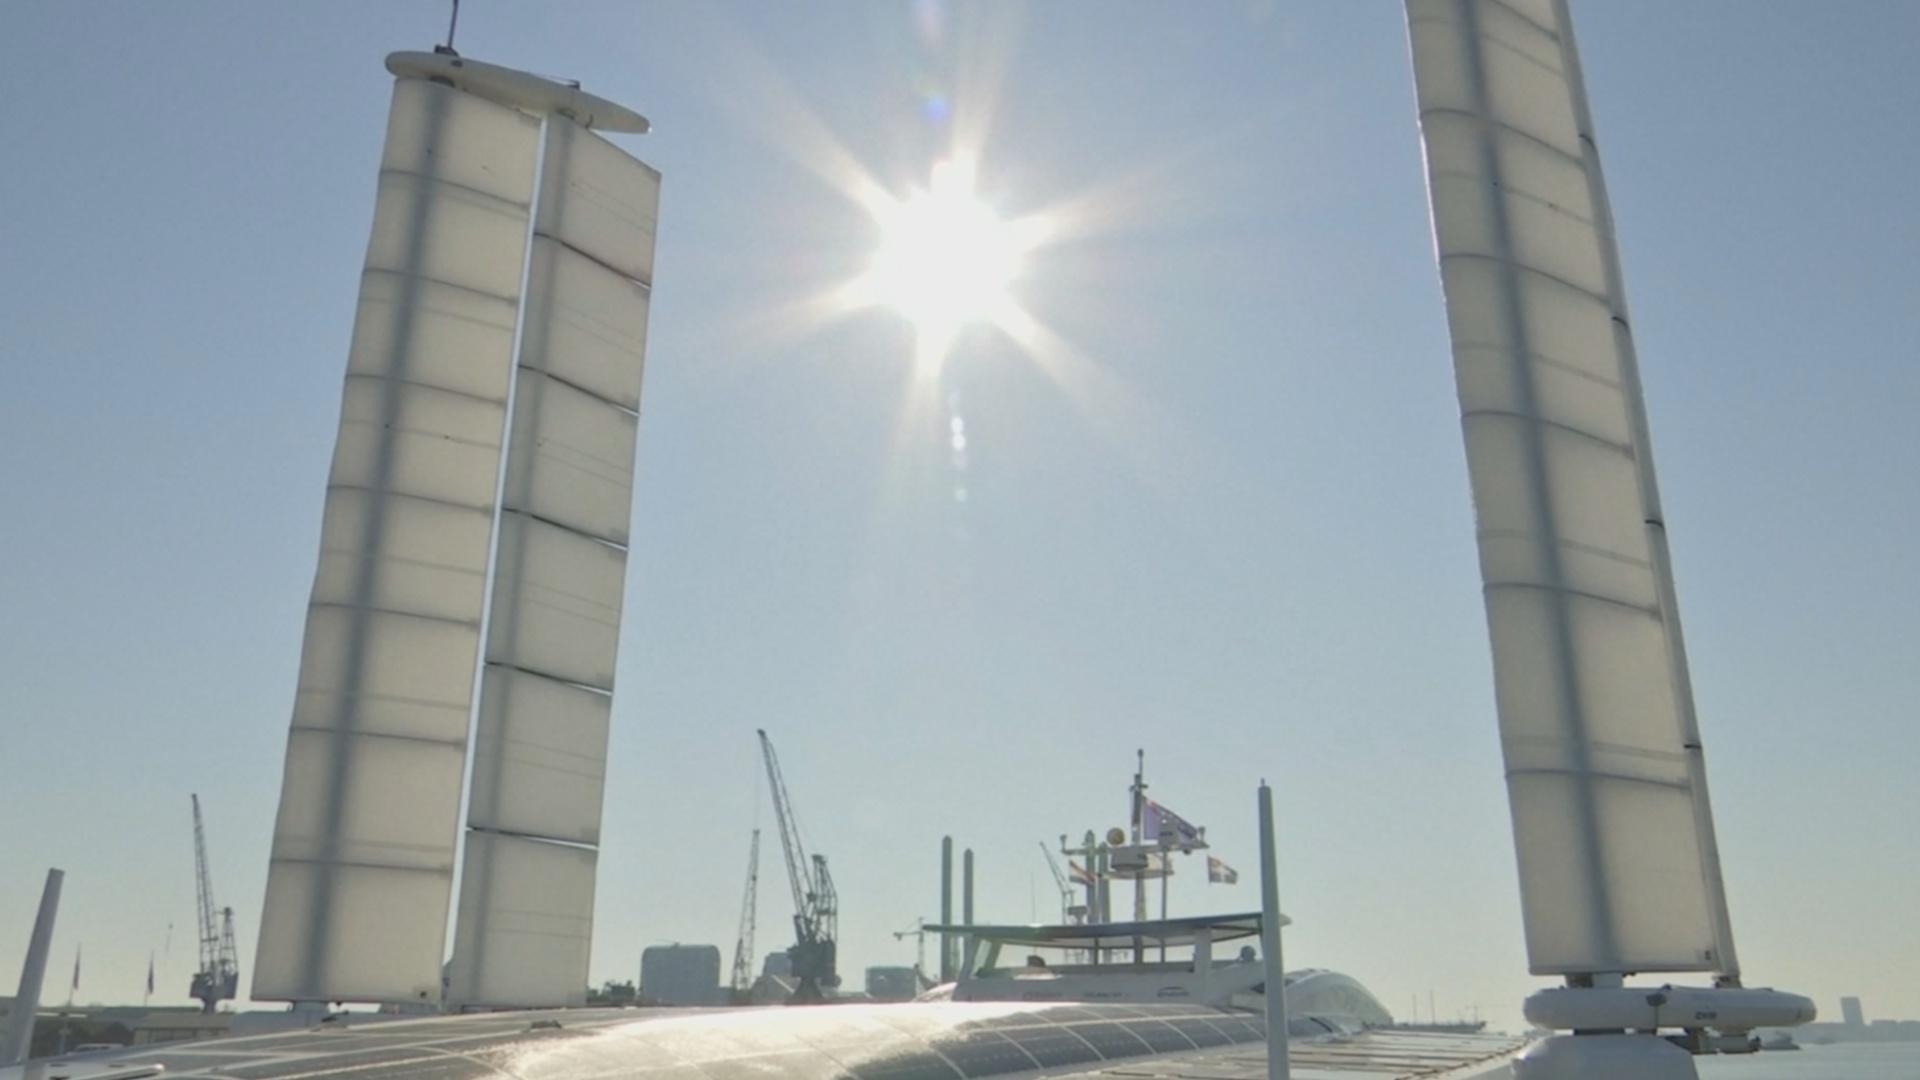 Катамаран, работающий на водороде, испытал ветродвигатели